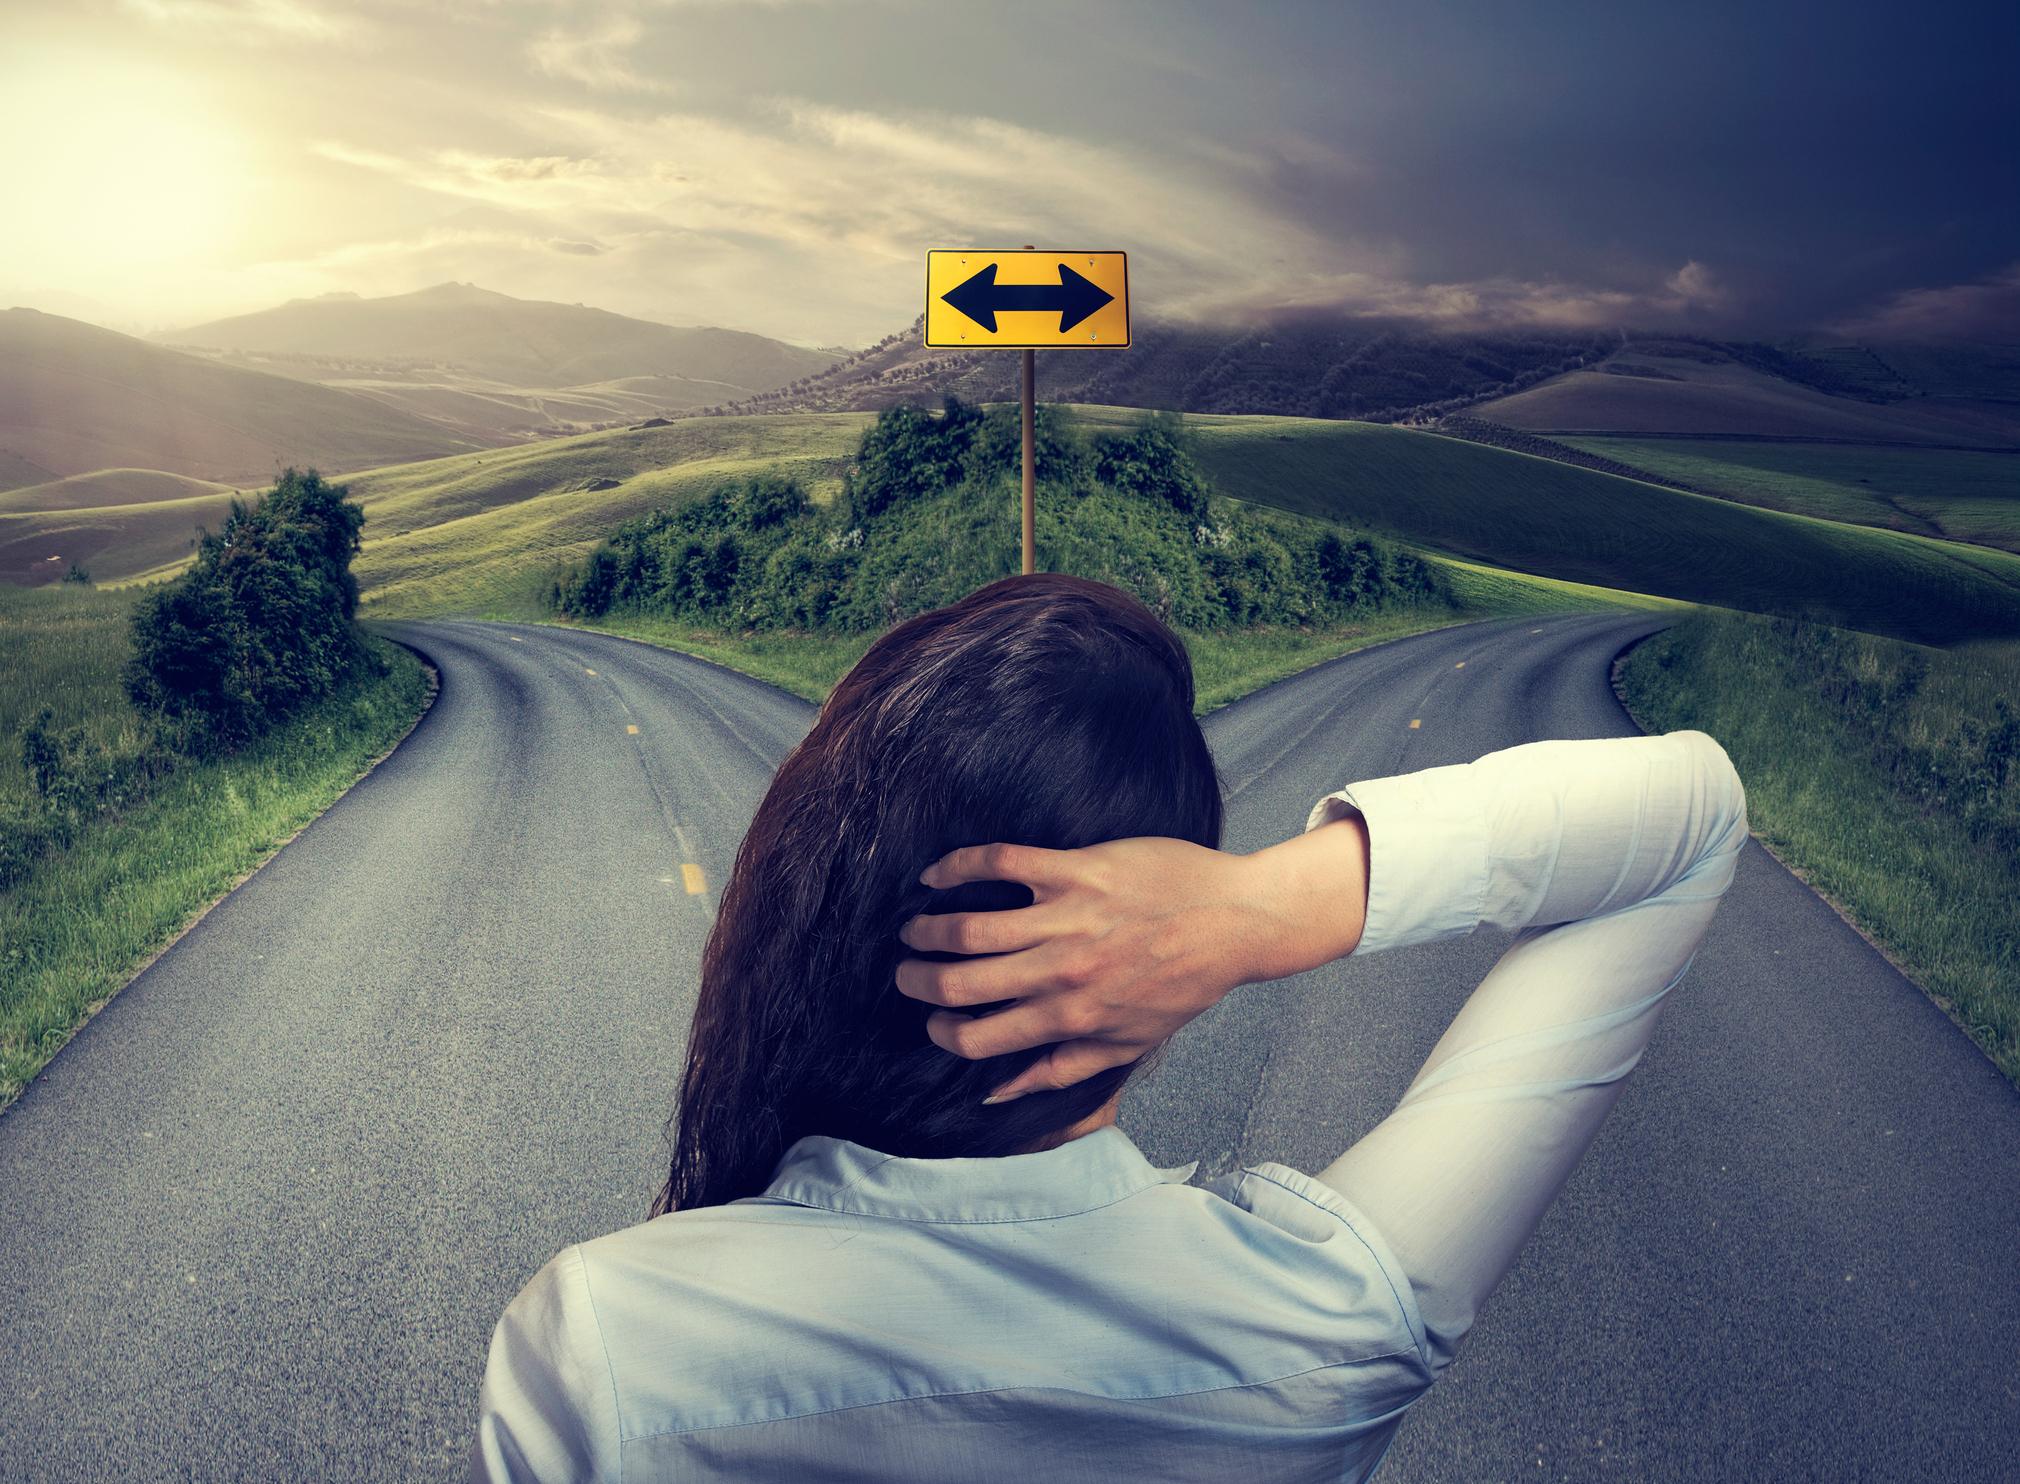 Business woman at a crossroads deciding.